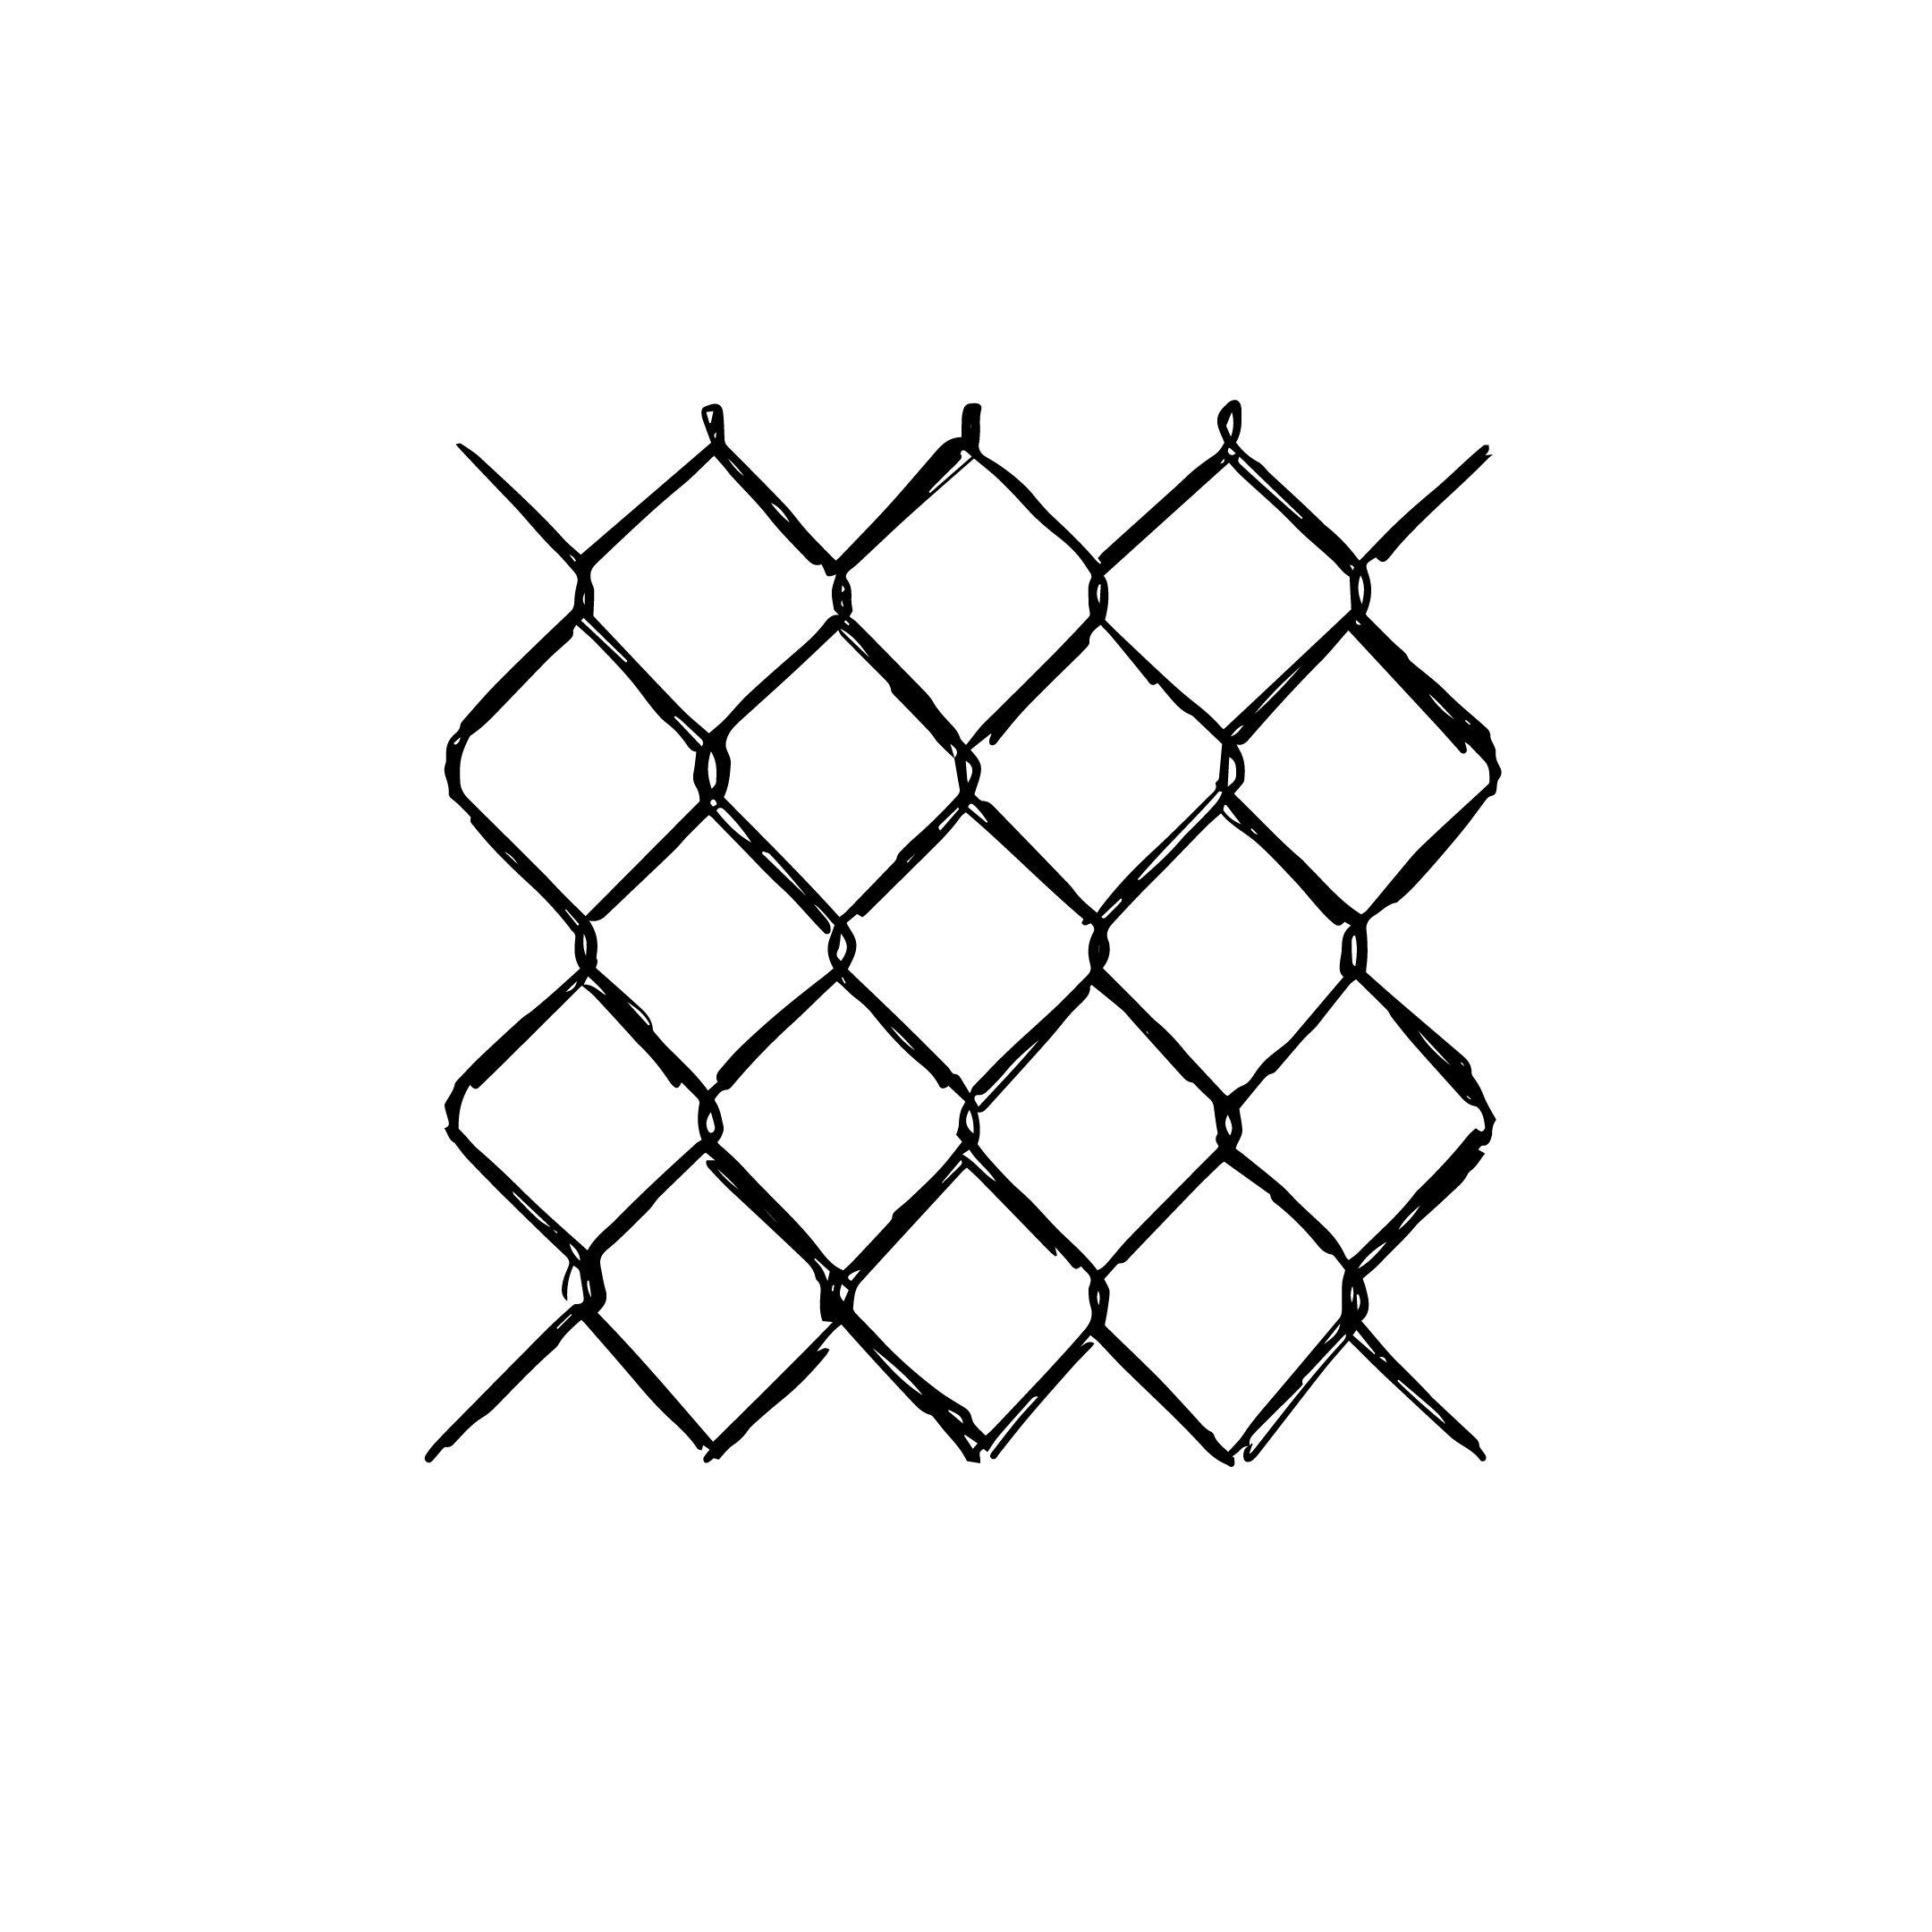 fence@2x-100.jpg